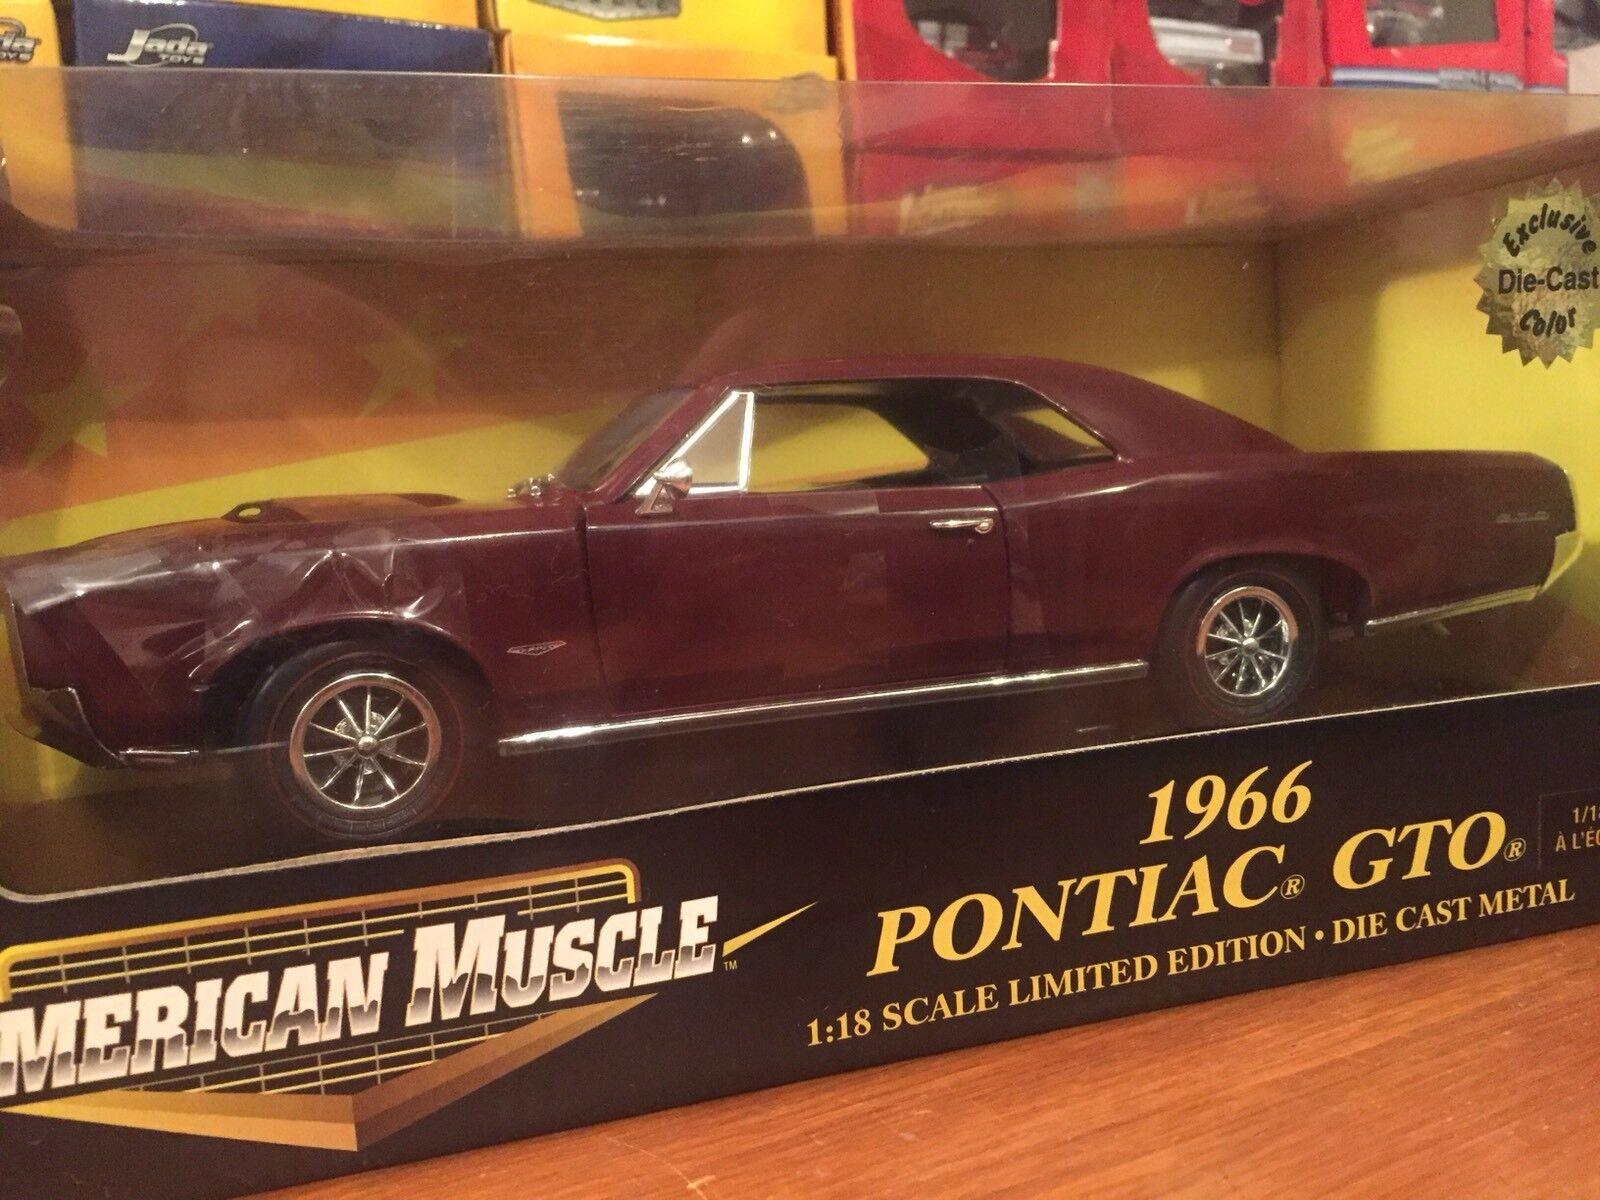 Ertl 1 18 1966 Pontiac GTO ToysRus Exclusive color. Item 32814